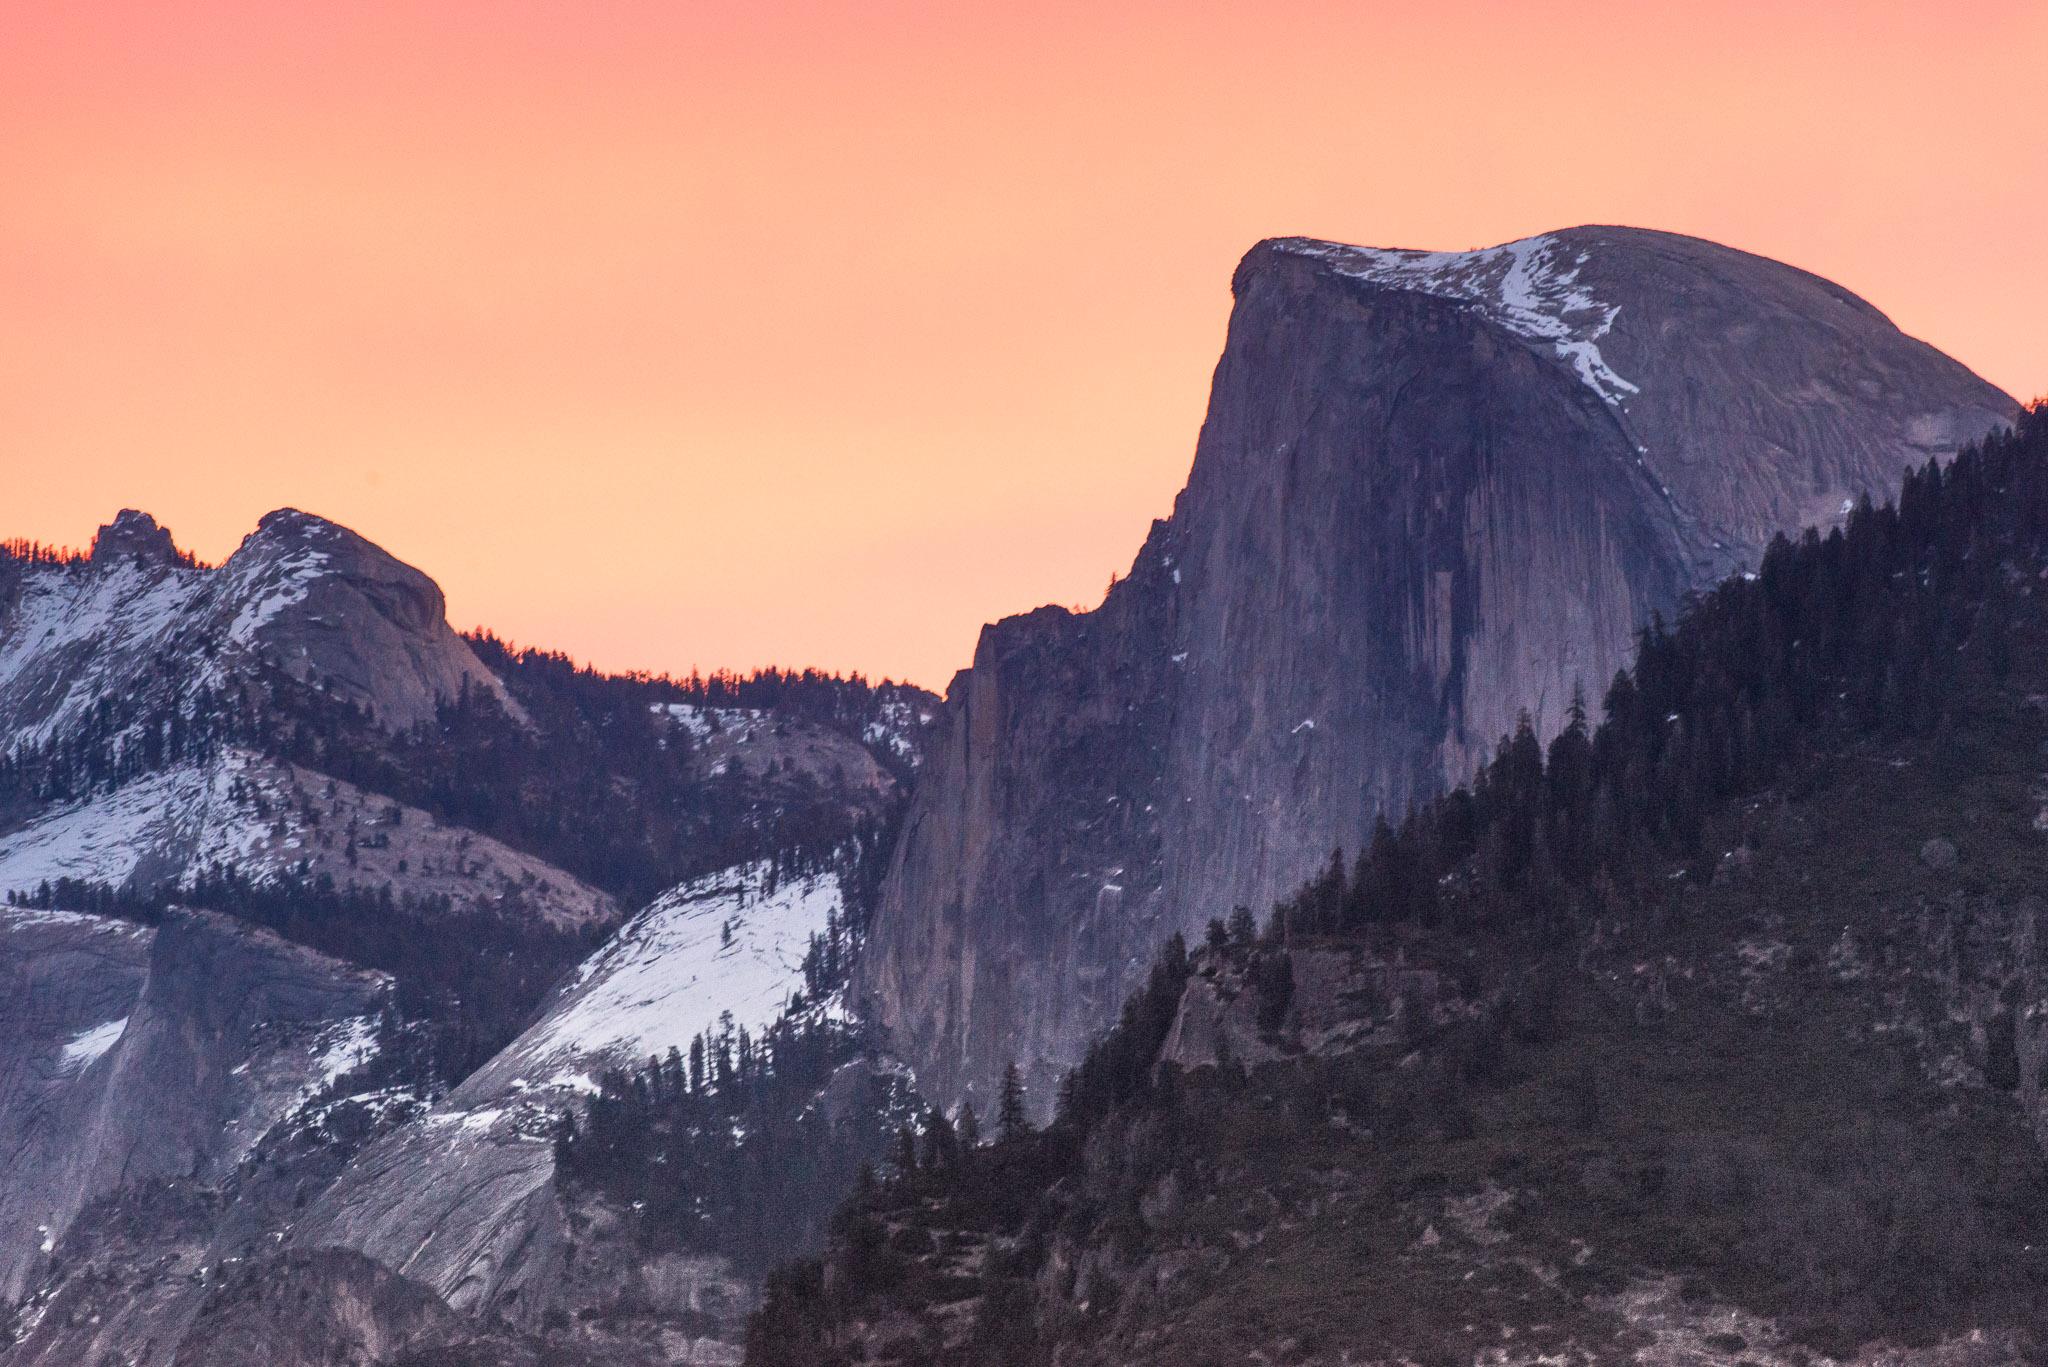 Jason-Davis-Images-Yosemite-0002.jpg